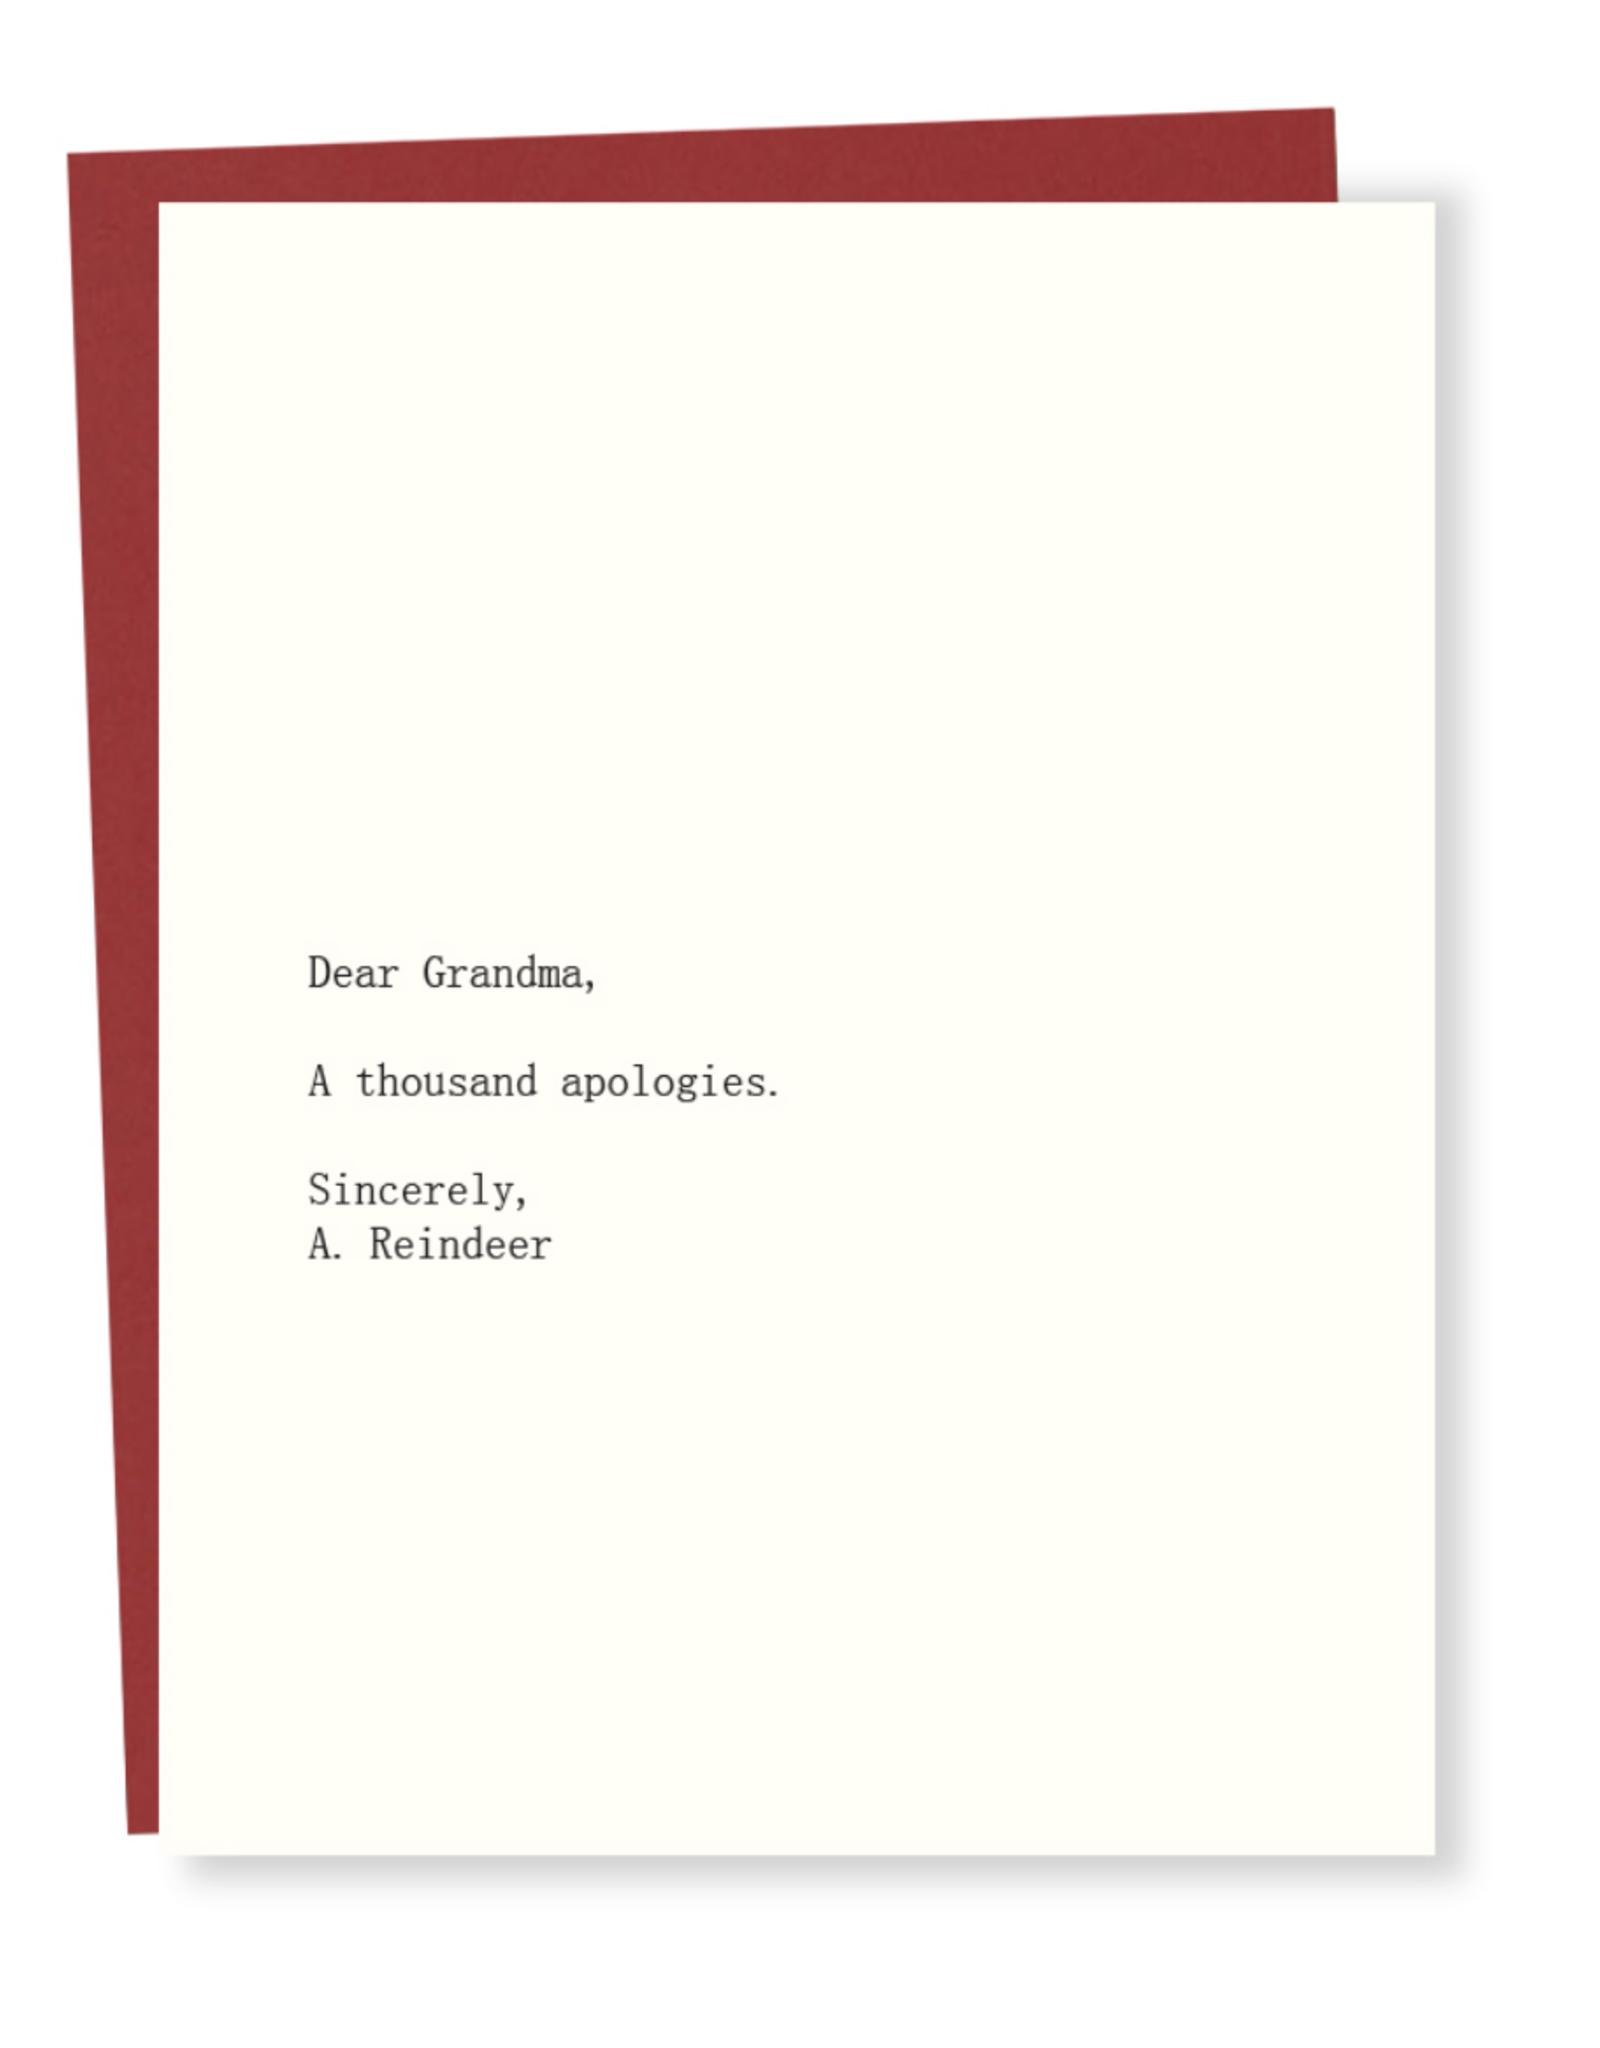 Dear Grandma - A Thousand Apologies Greeting Card